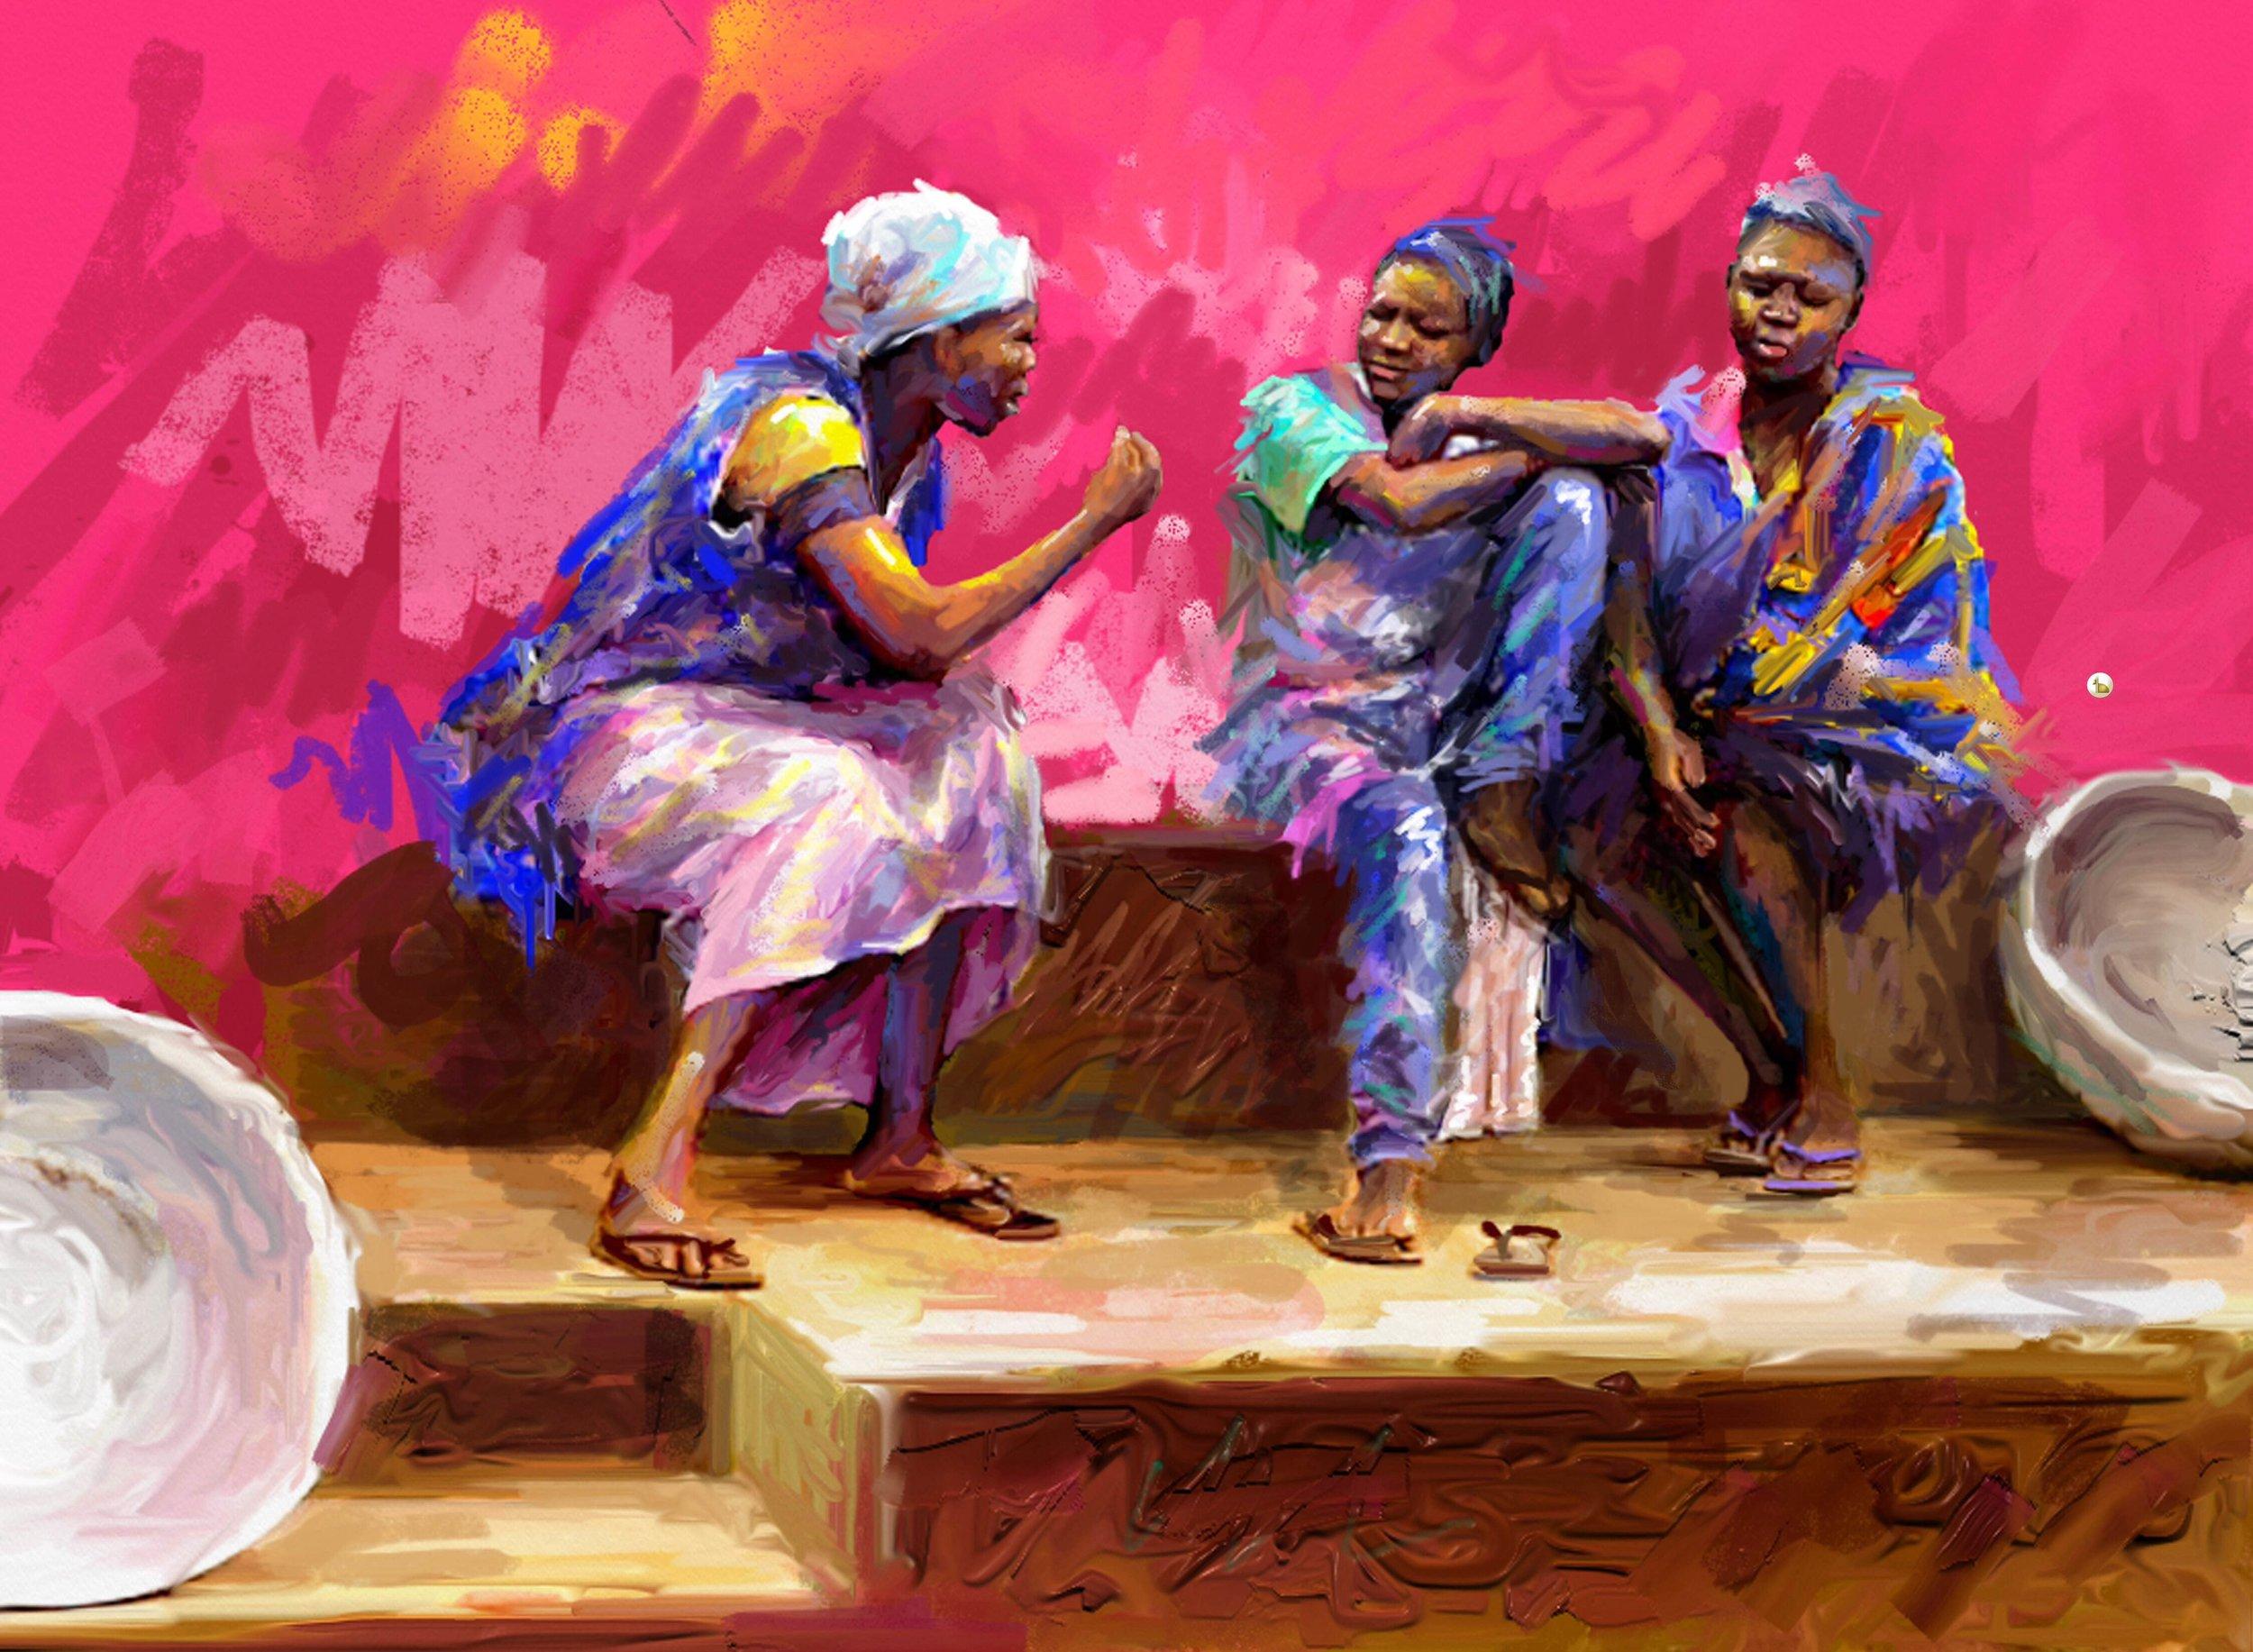 Painting by Gorden Keyga